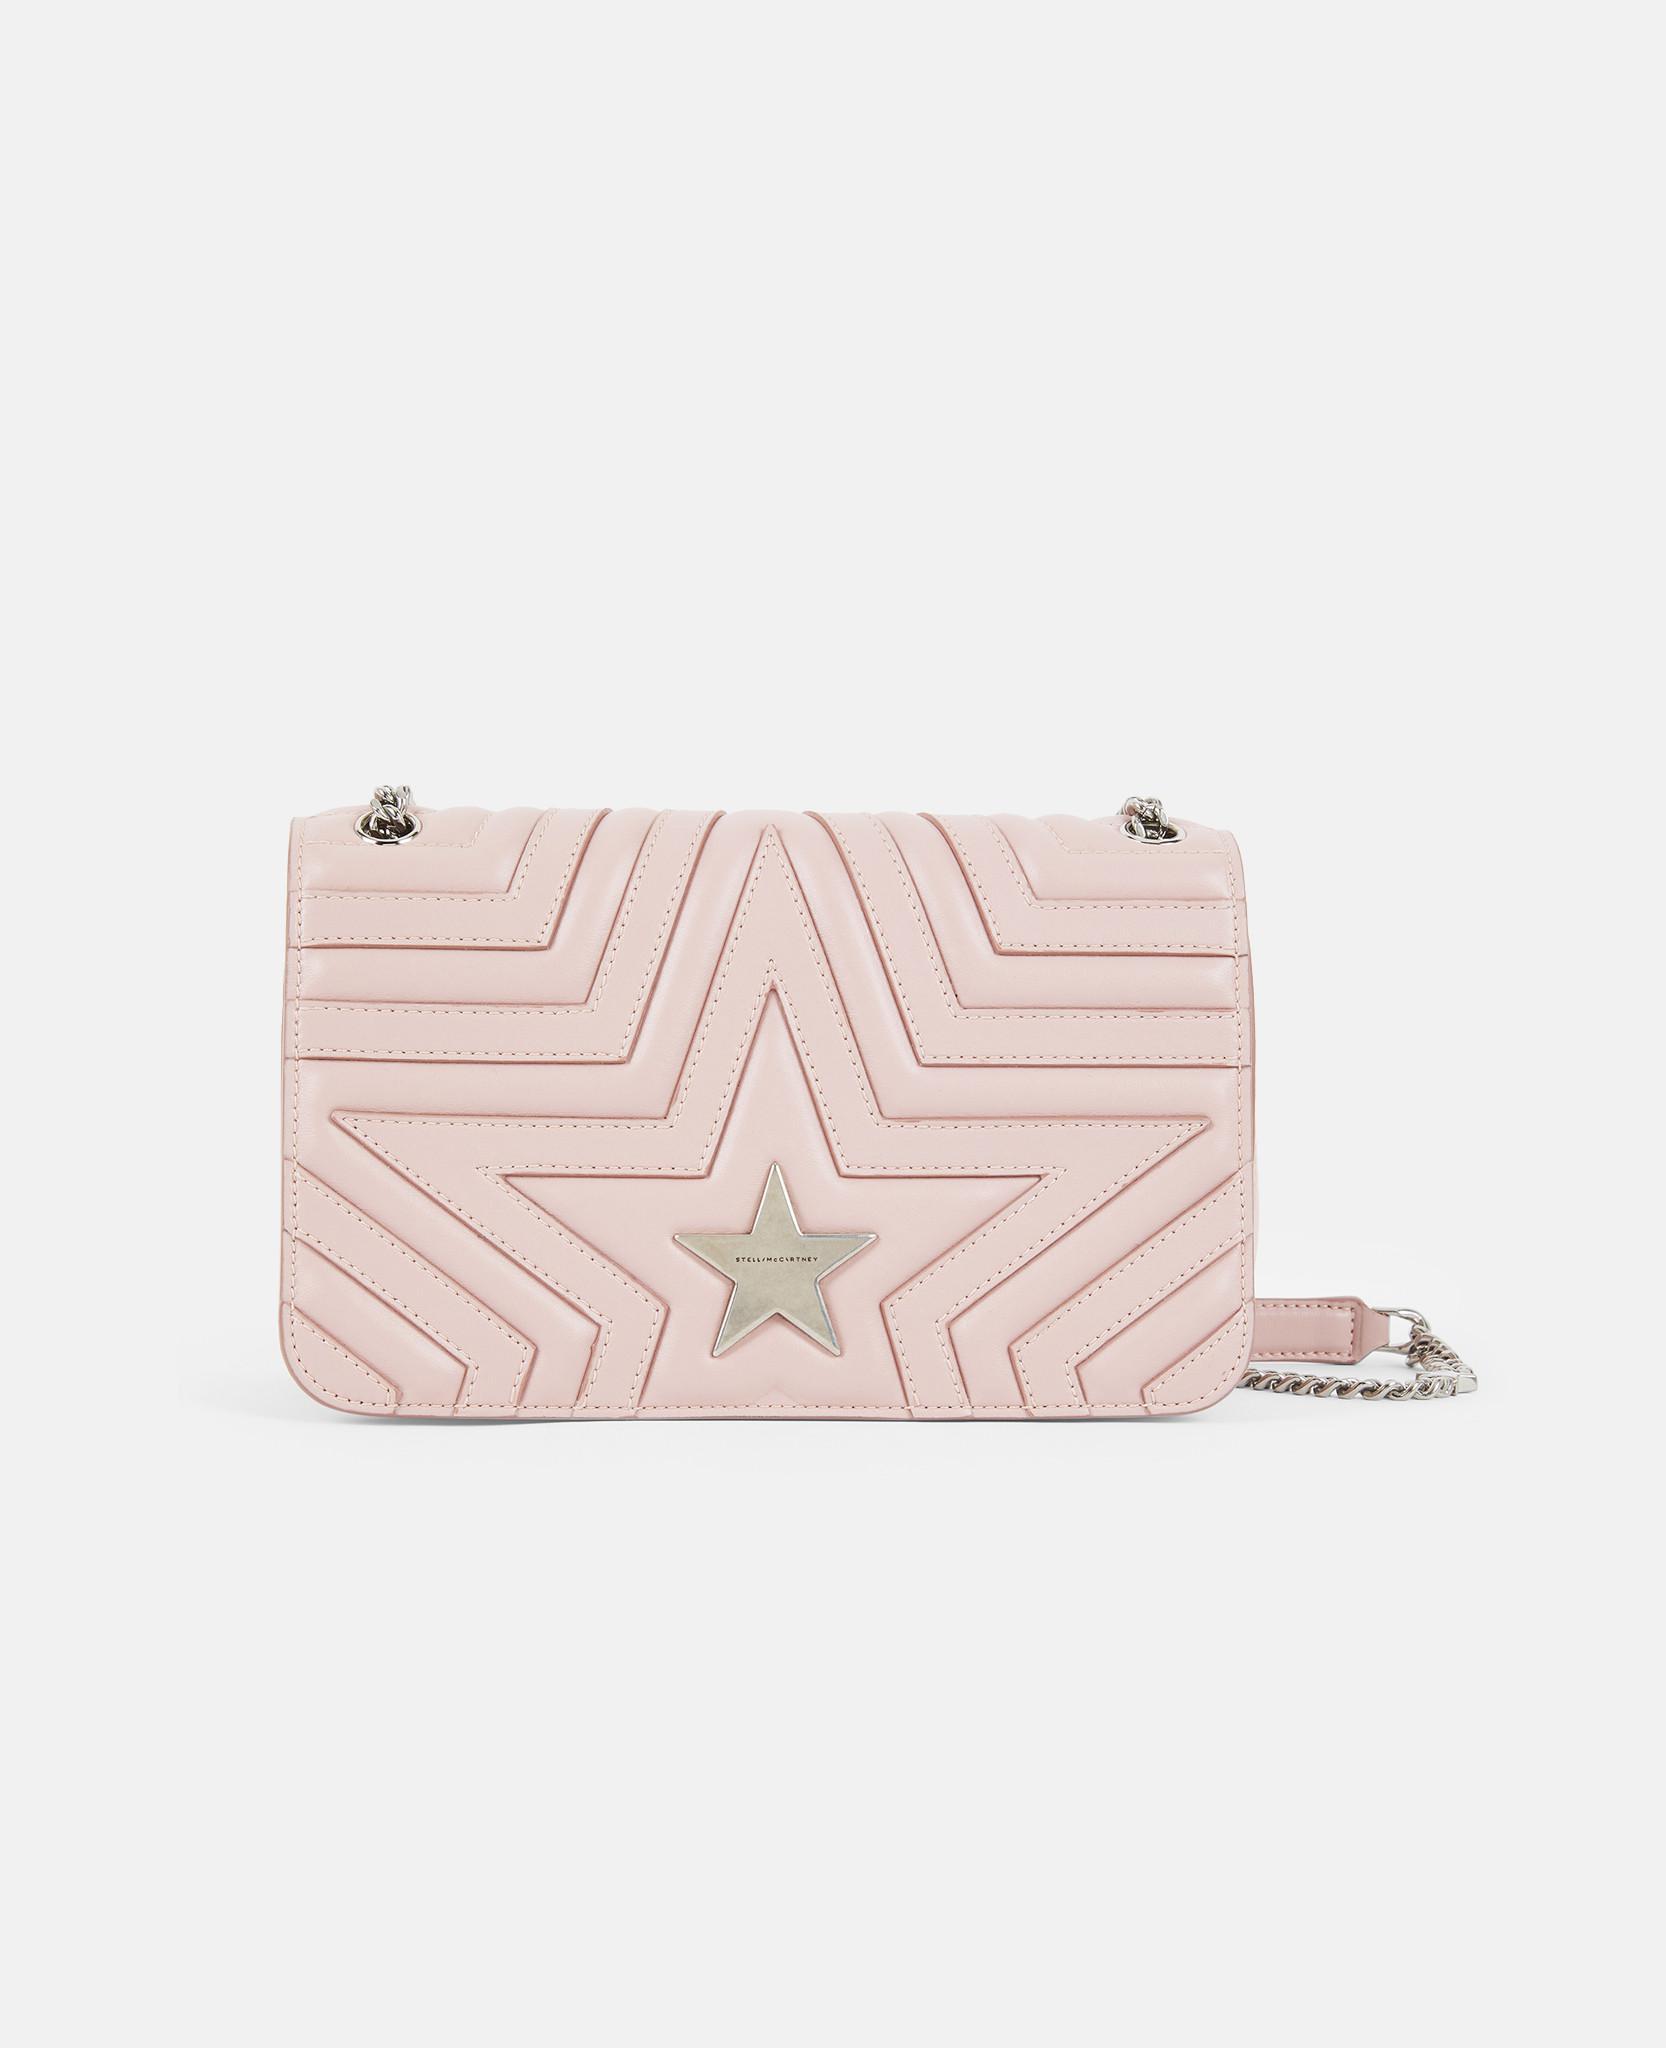 Lyst - Stella McCartney Stella Star Flap-over Shoulder Bag in Pink 893717dc7391a